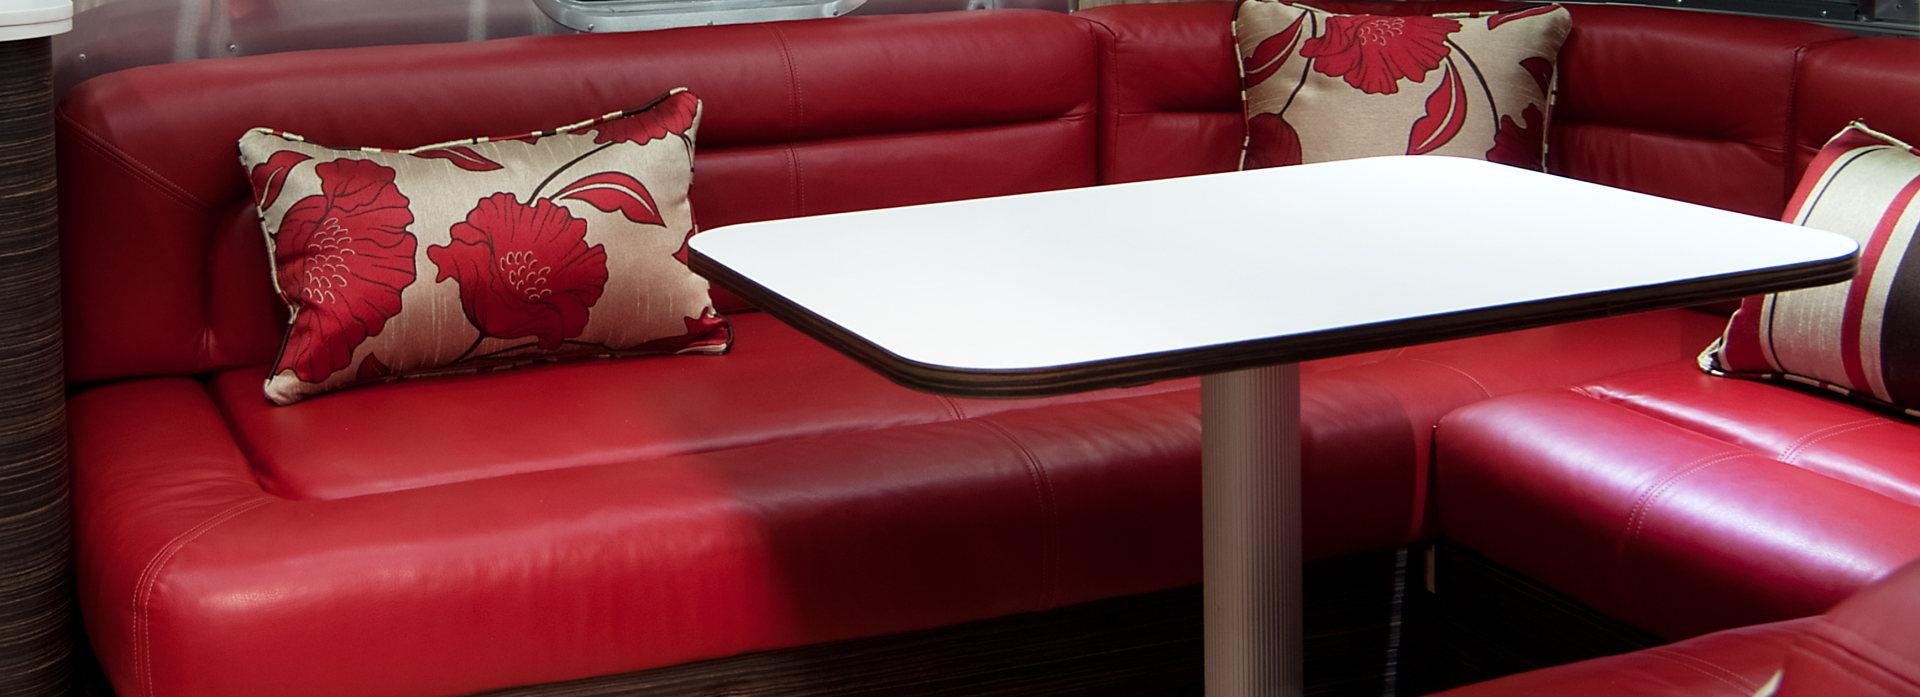 Polsterung Premium Leder Rot